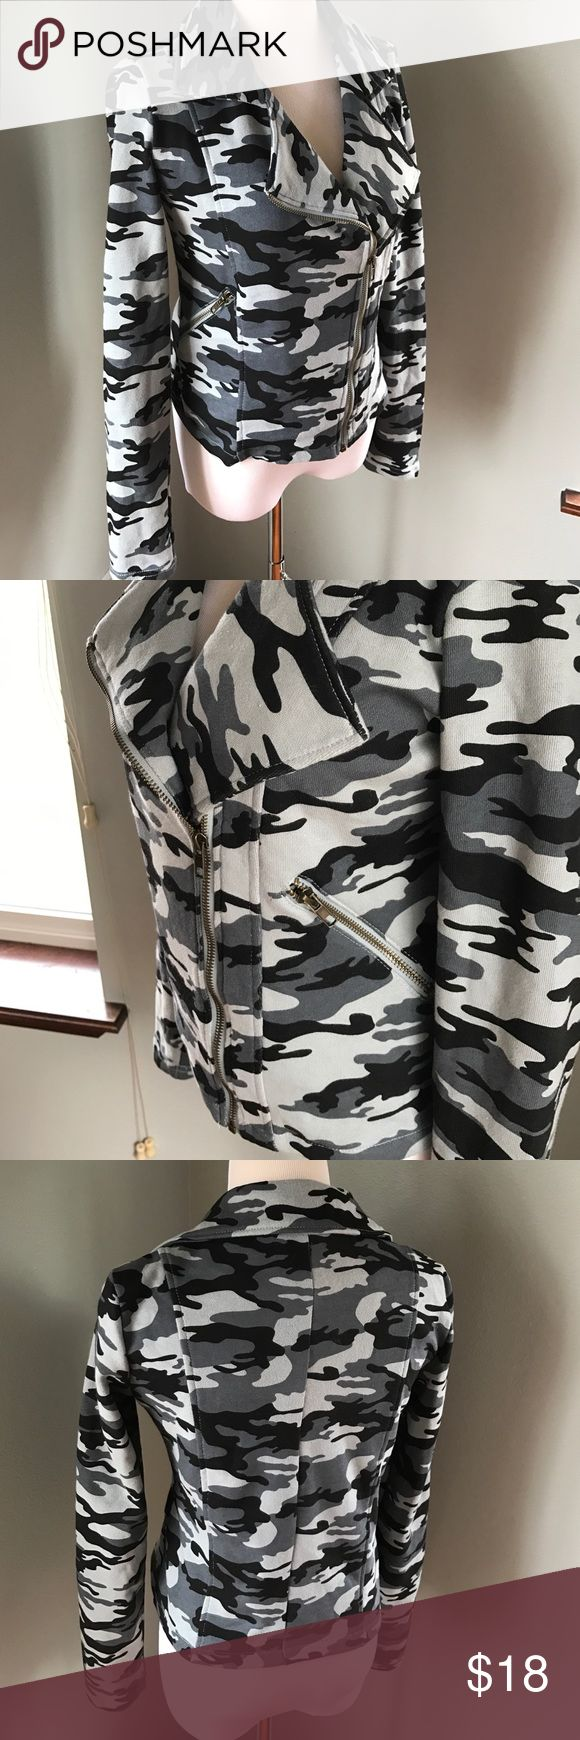 Rue21 Camouflage Sweatshirt Jacket Zip Up Like new condition. Really cozy and warm. Rue 21 Tops Sweatshirts & Hoodies